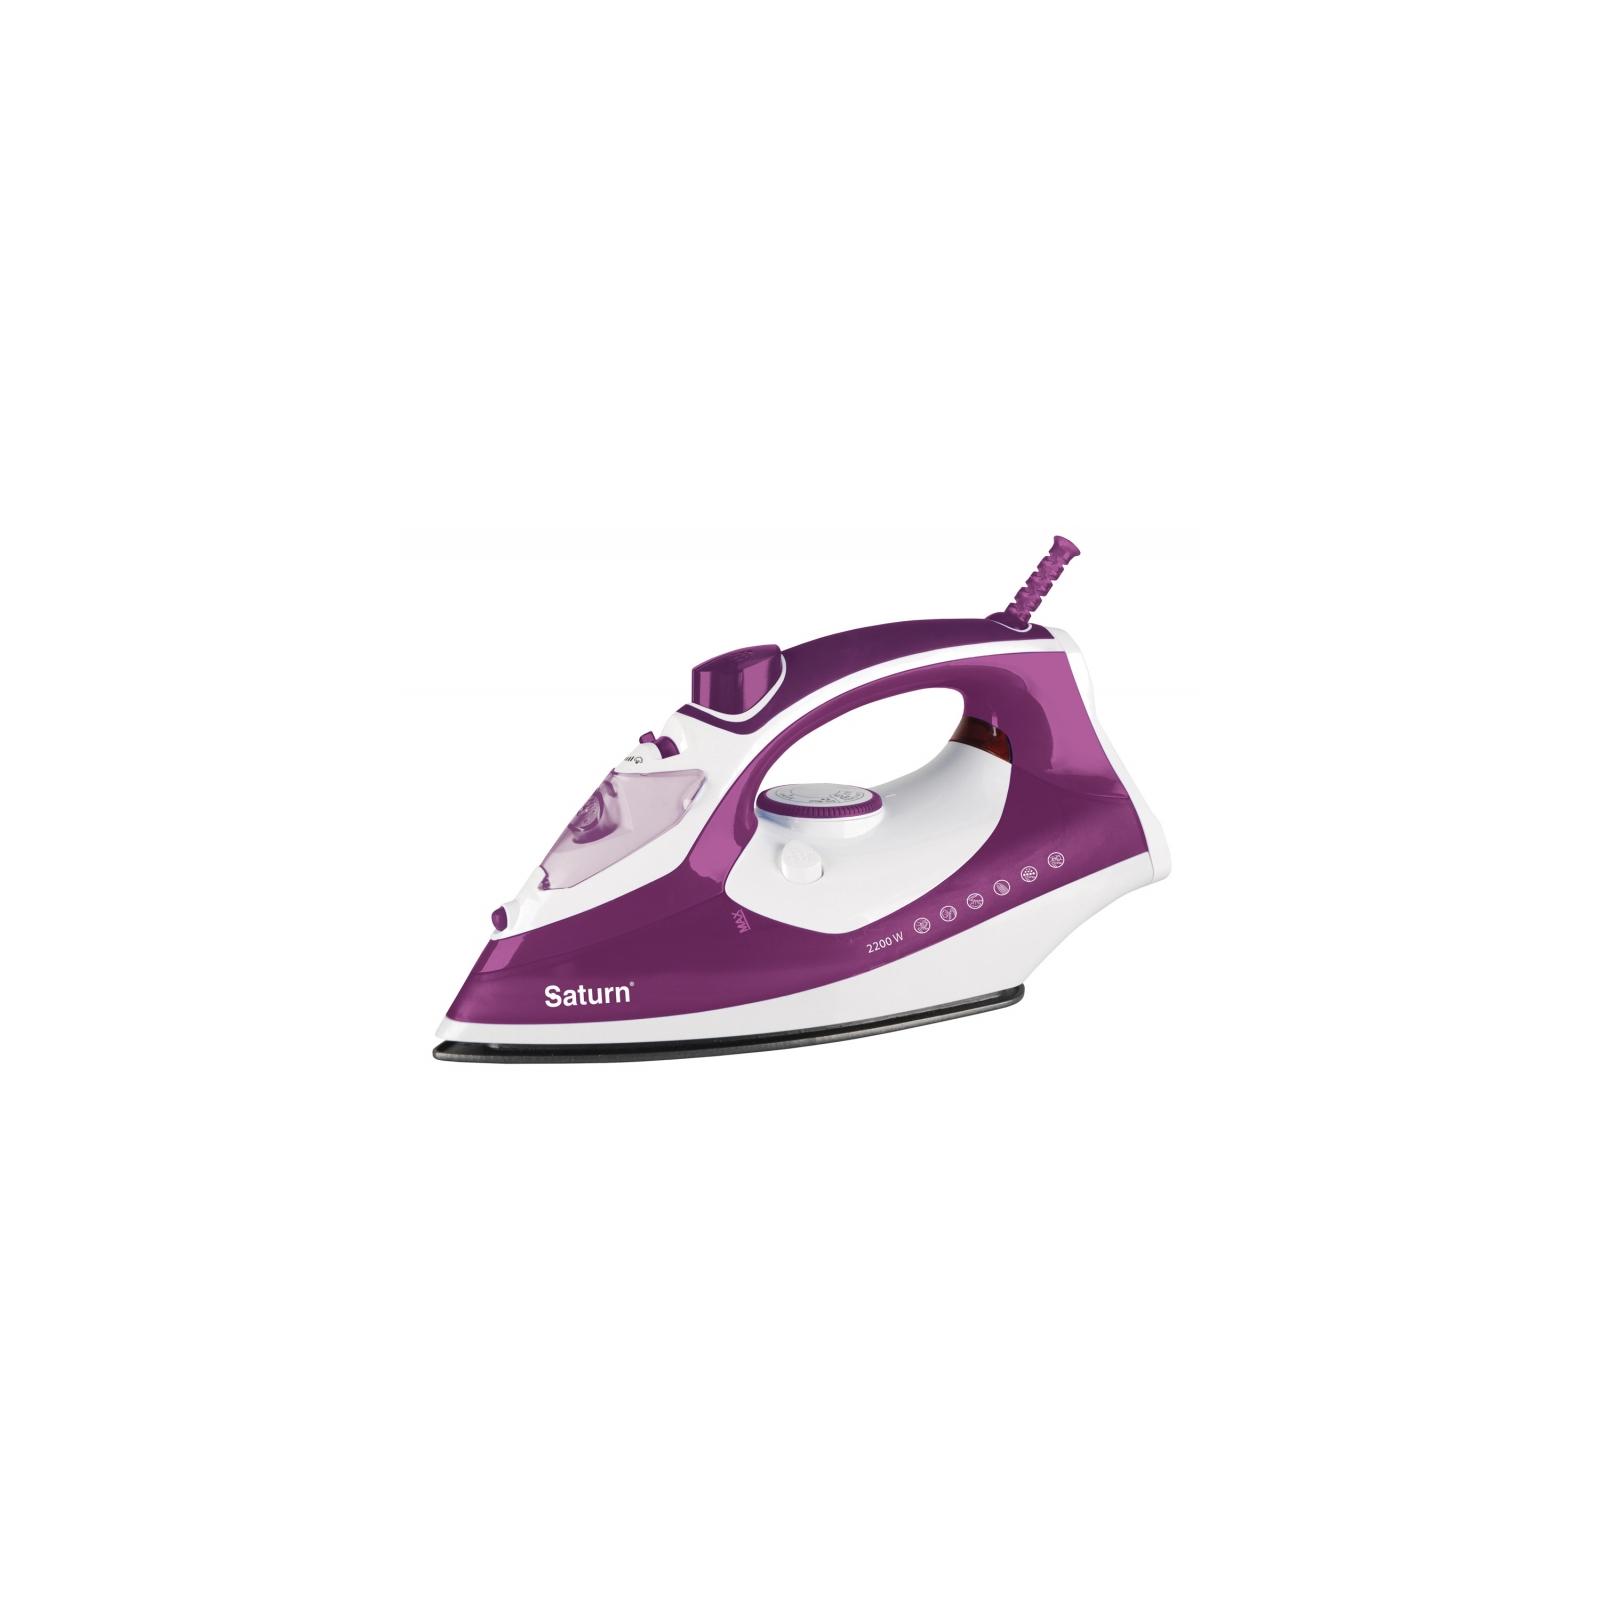 Утюг SATURN ST-CC7115 violet